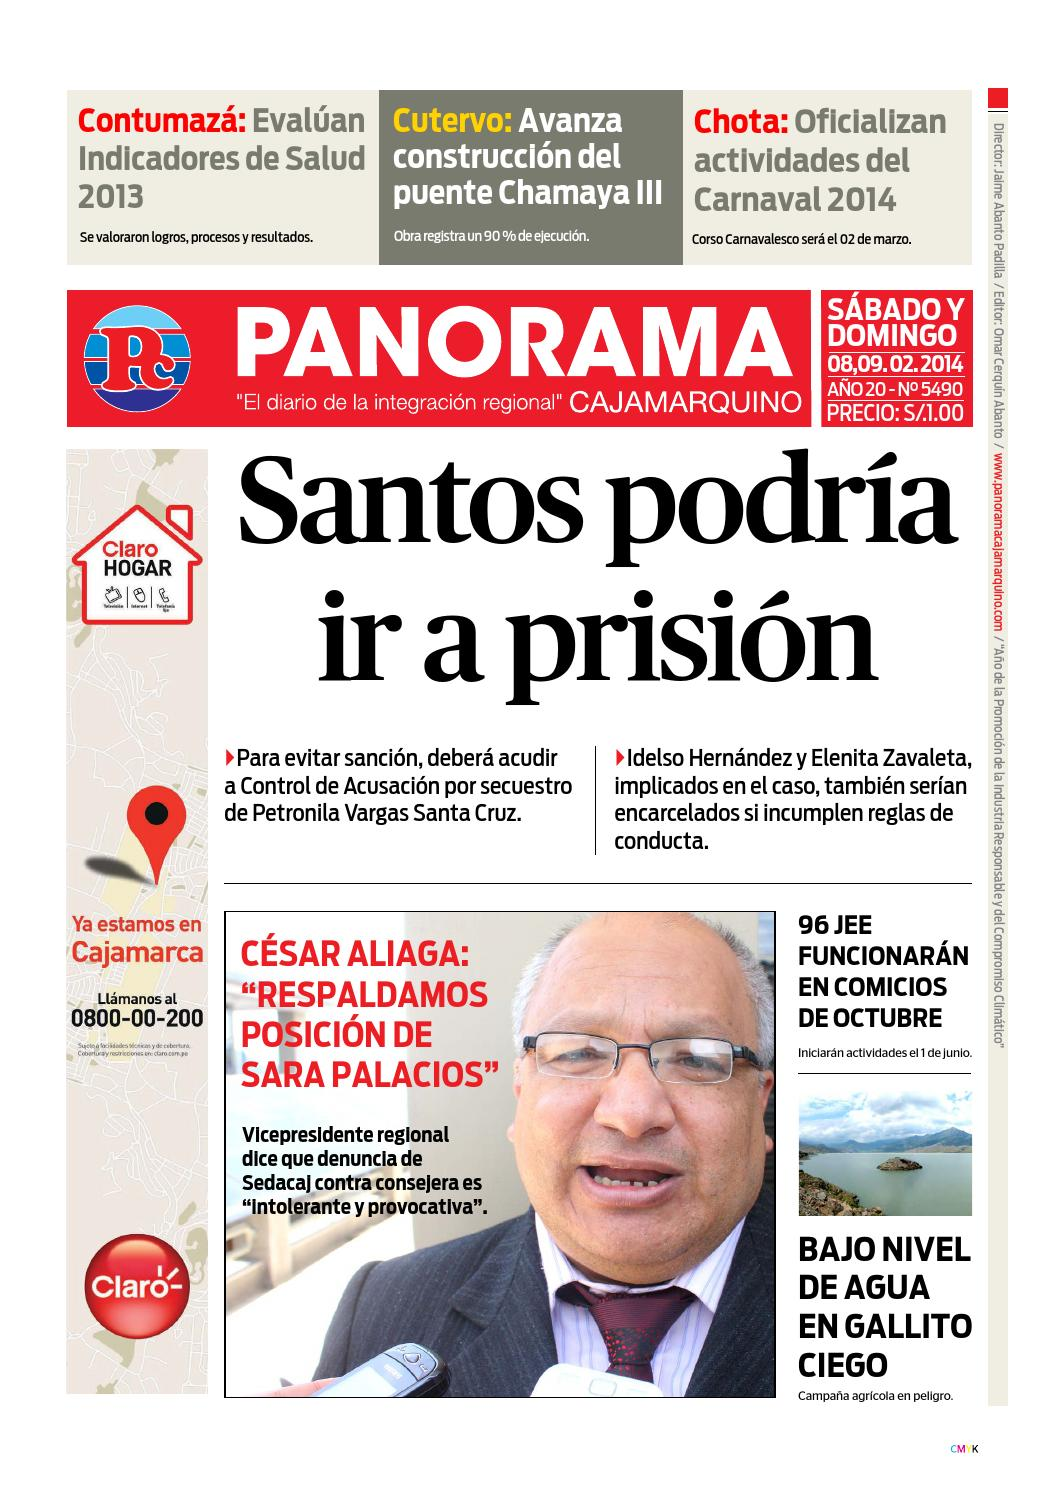 Diario 08 02 2014 by Panorama Cajamarquino - issuu